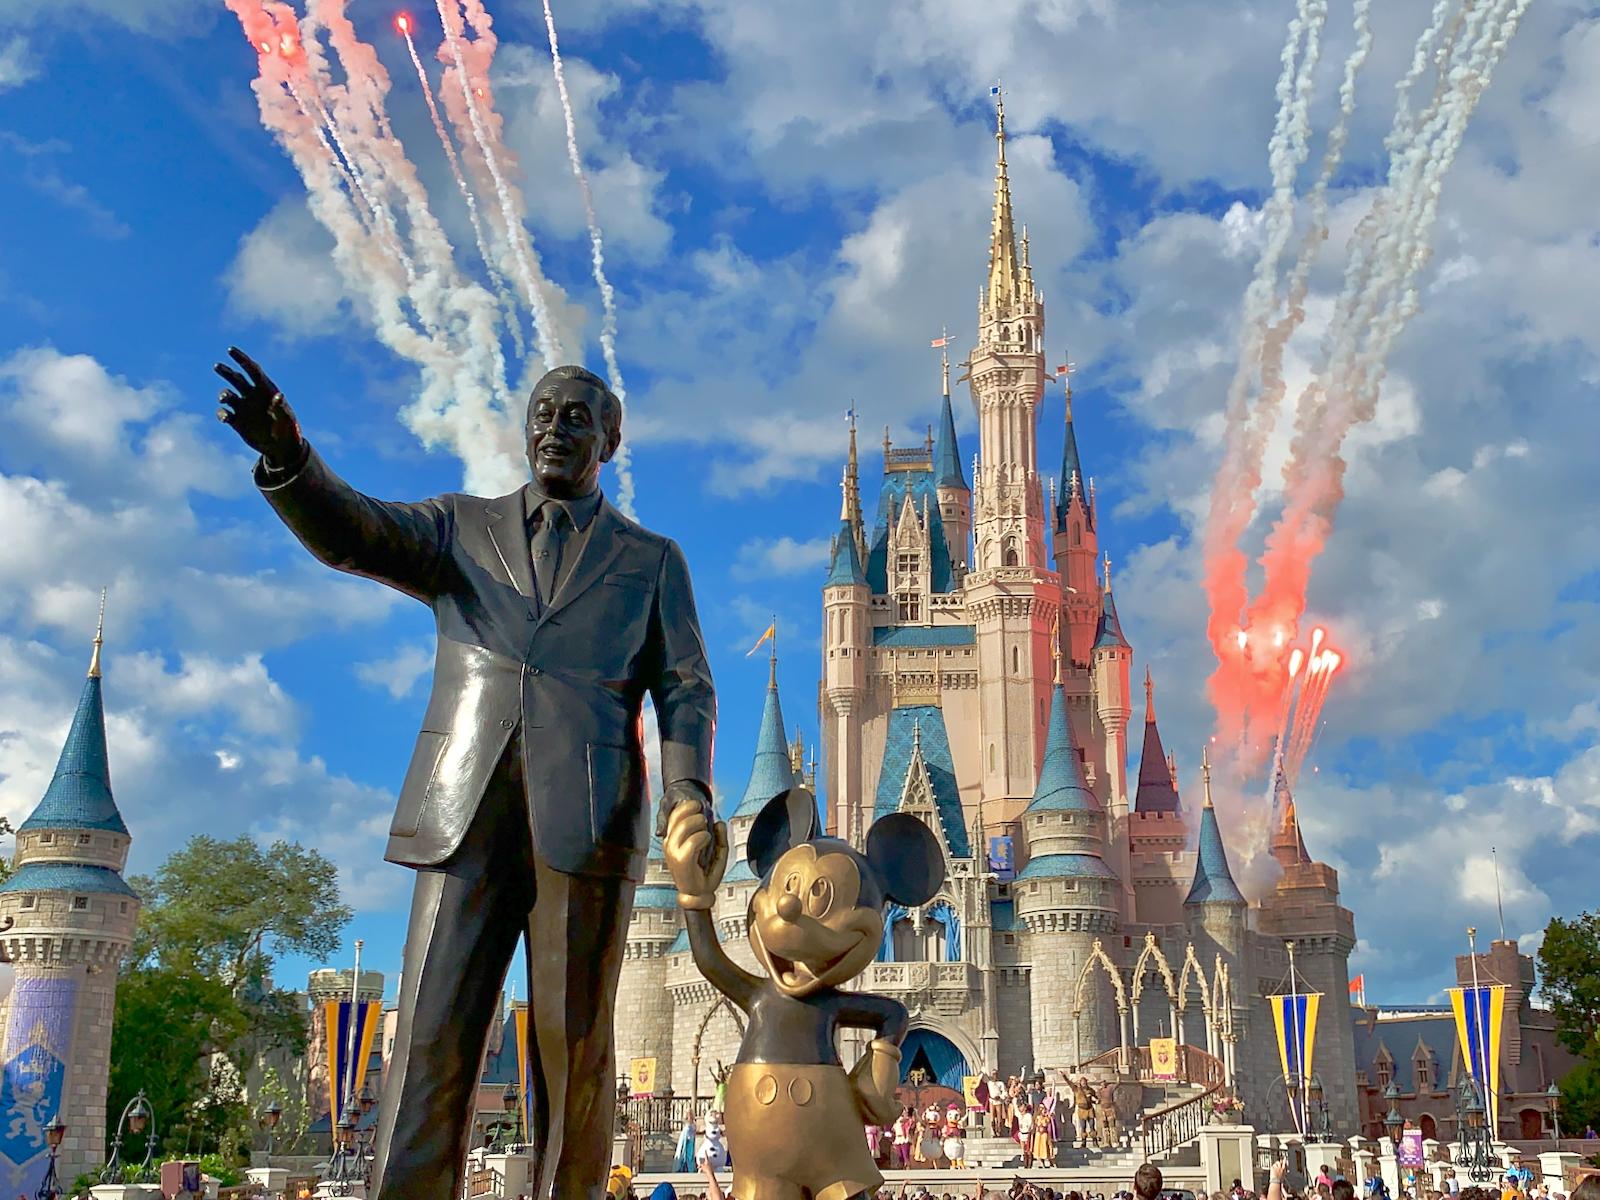 Mouseplanet – Walt Disney World Resort Update For April 7 13 In Shanghai Disney August 2021 Calender Anual Pass